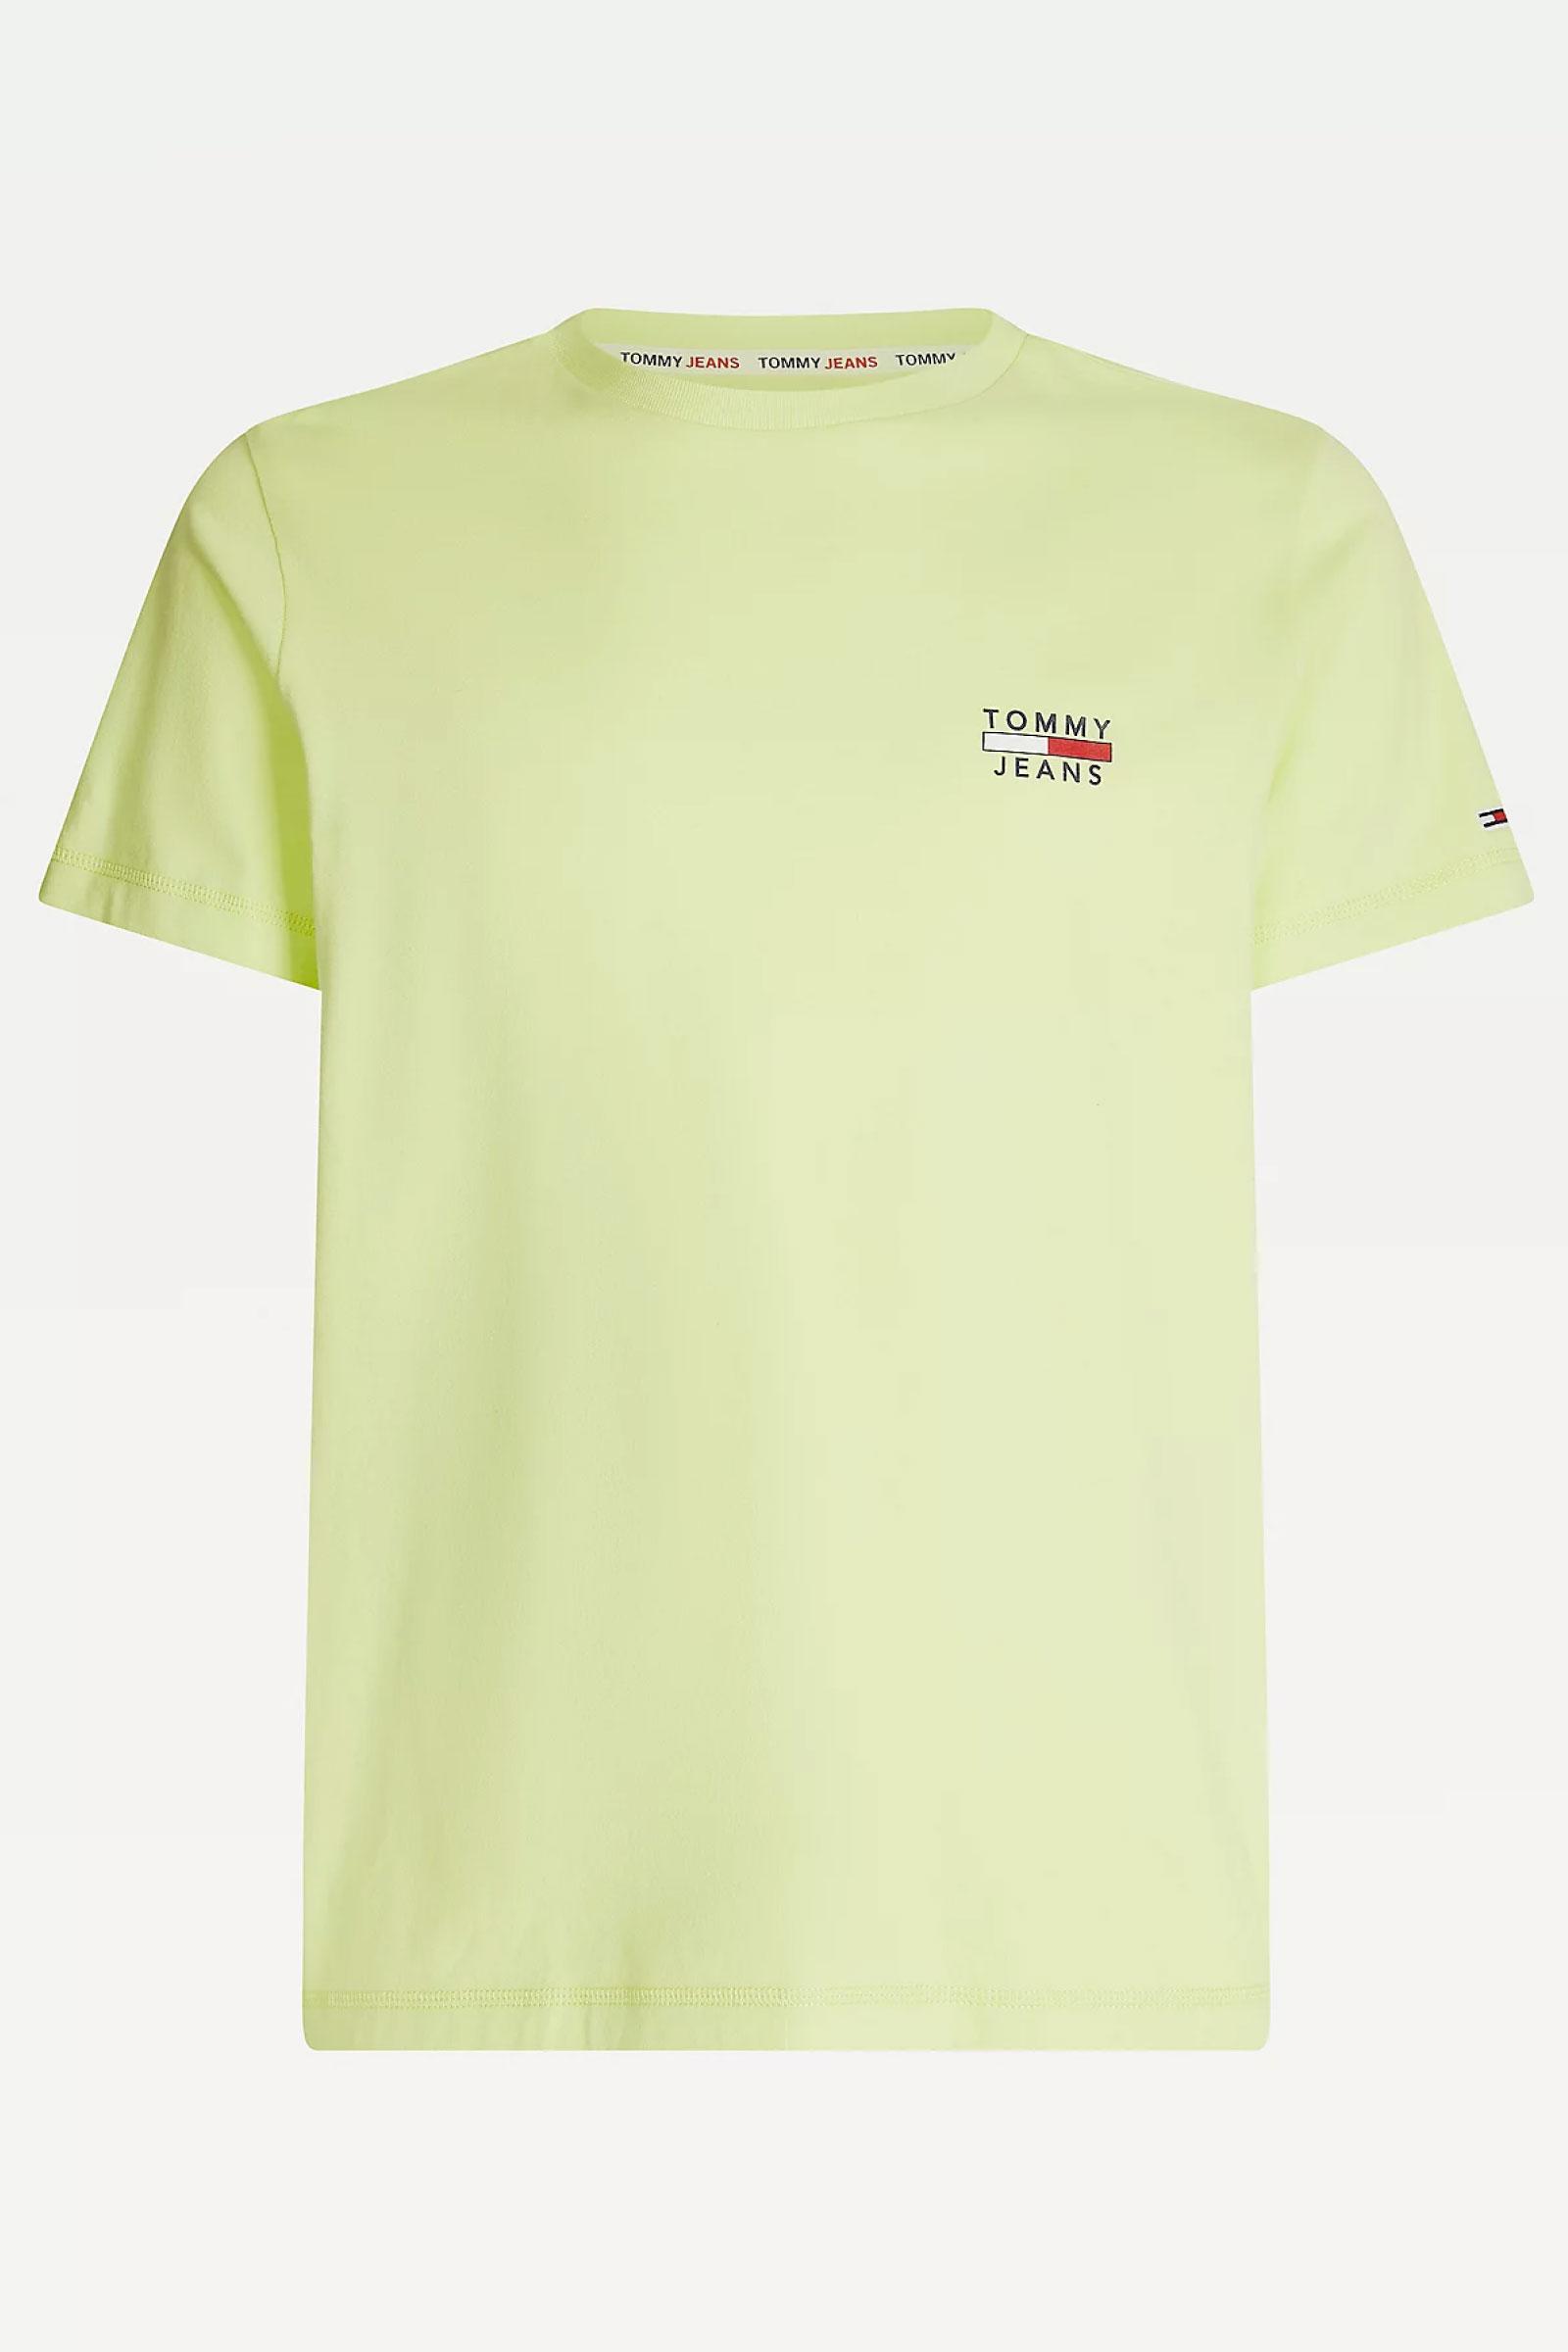 TOMMY JEANS T-Shirt Uomo TOMMY JEANS | T-Shirt | DM0DM10099LT3